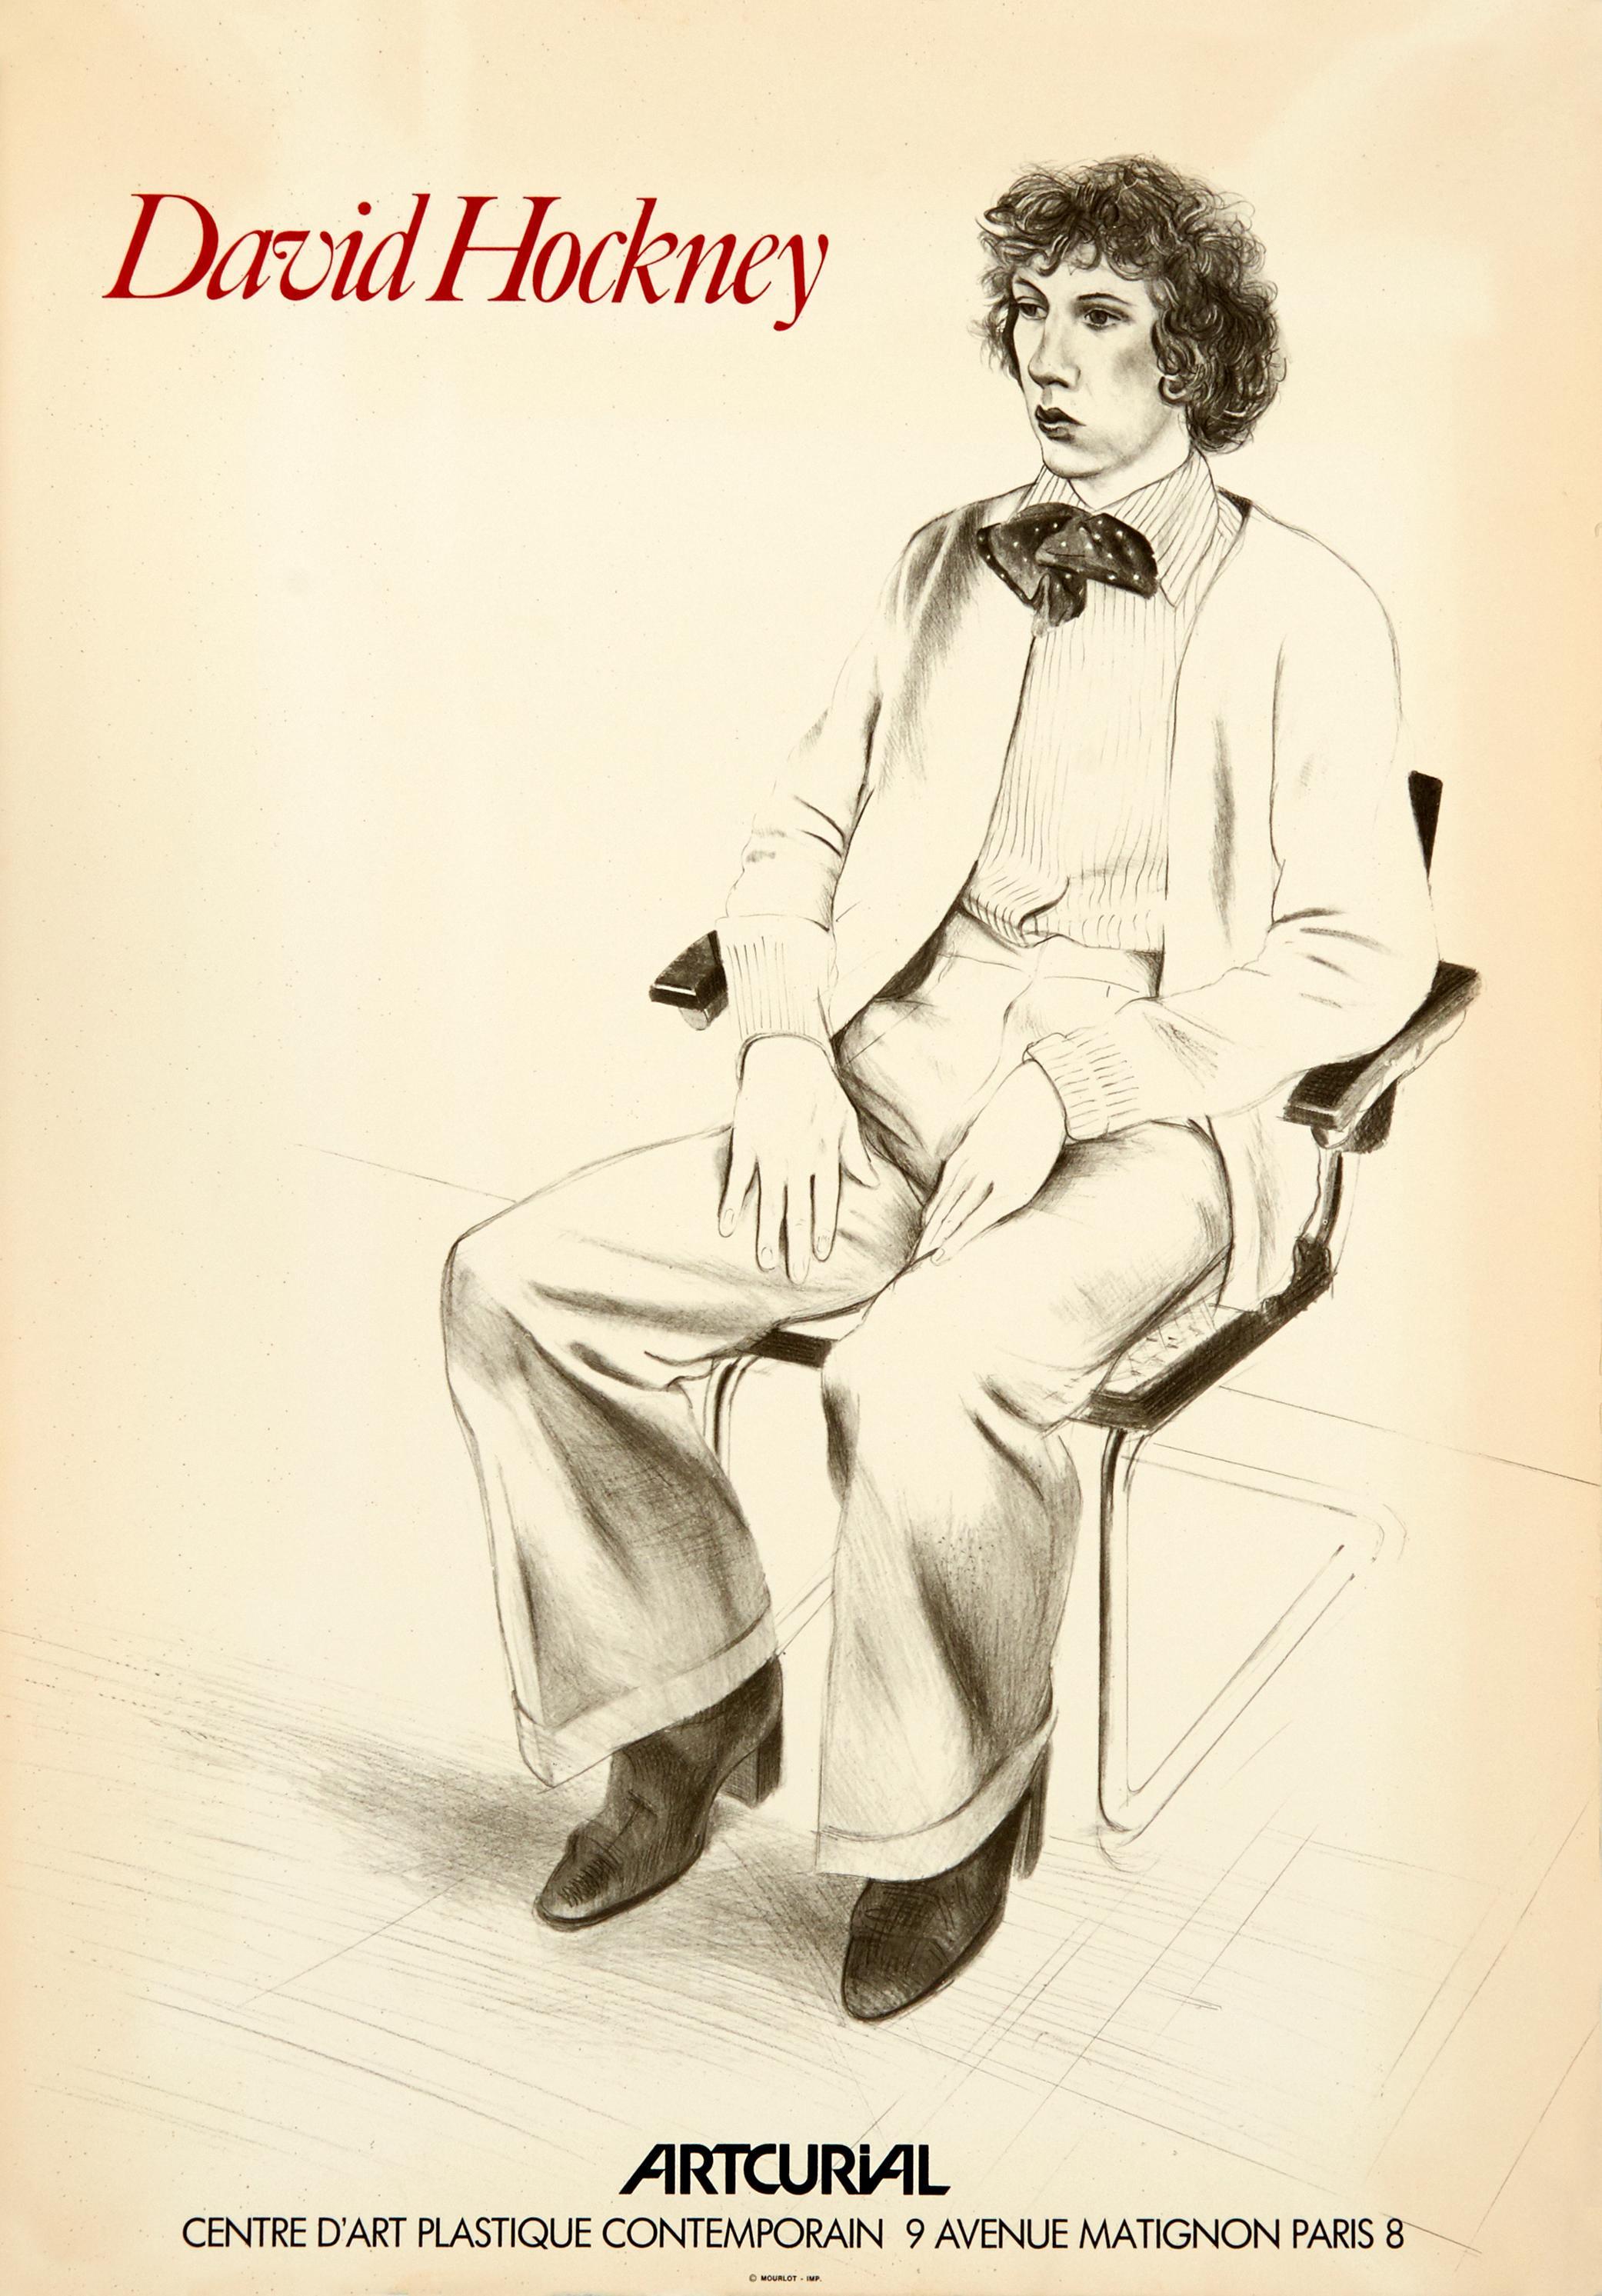 Portrait of Gregory Evans - Artcurial, Original Lithographic Poster, 1979